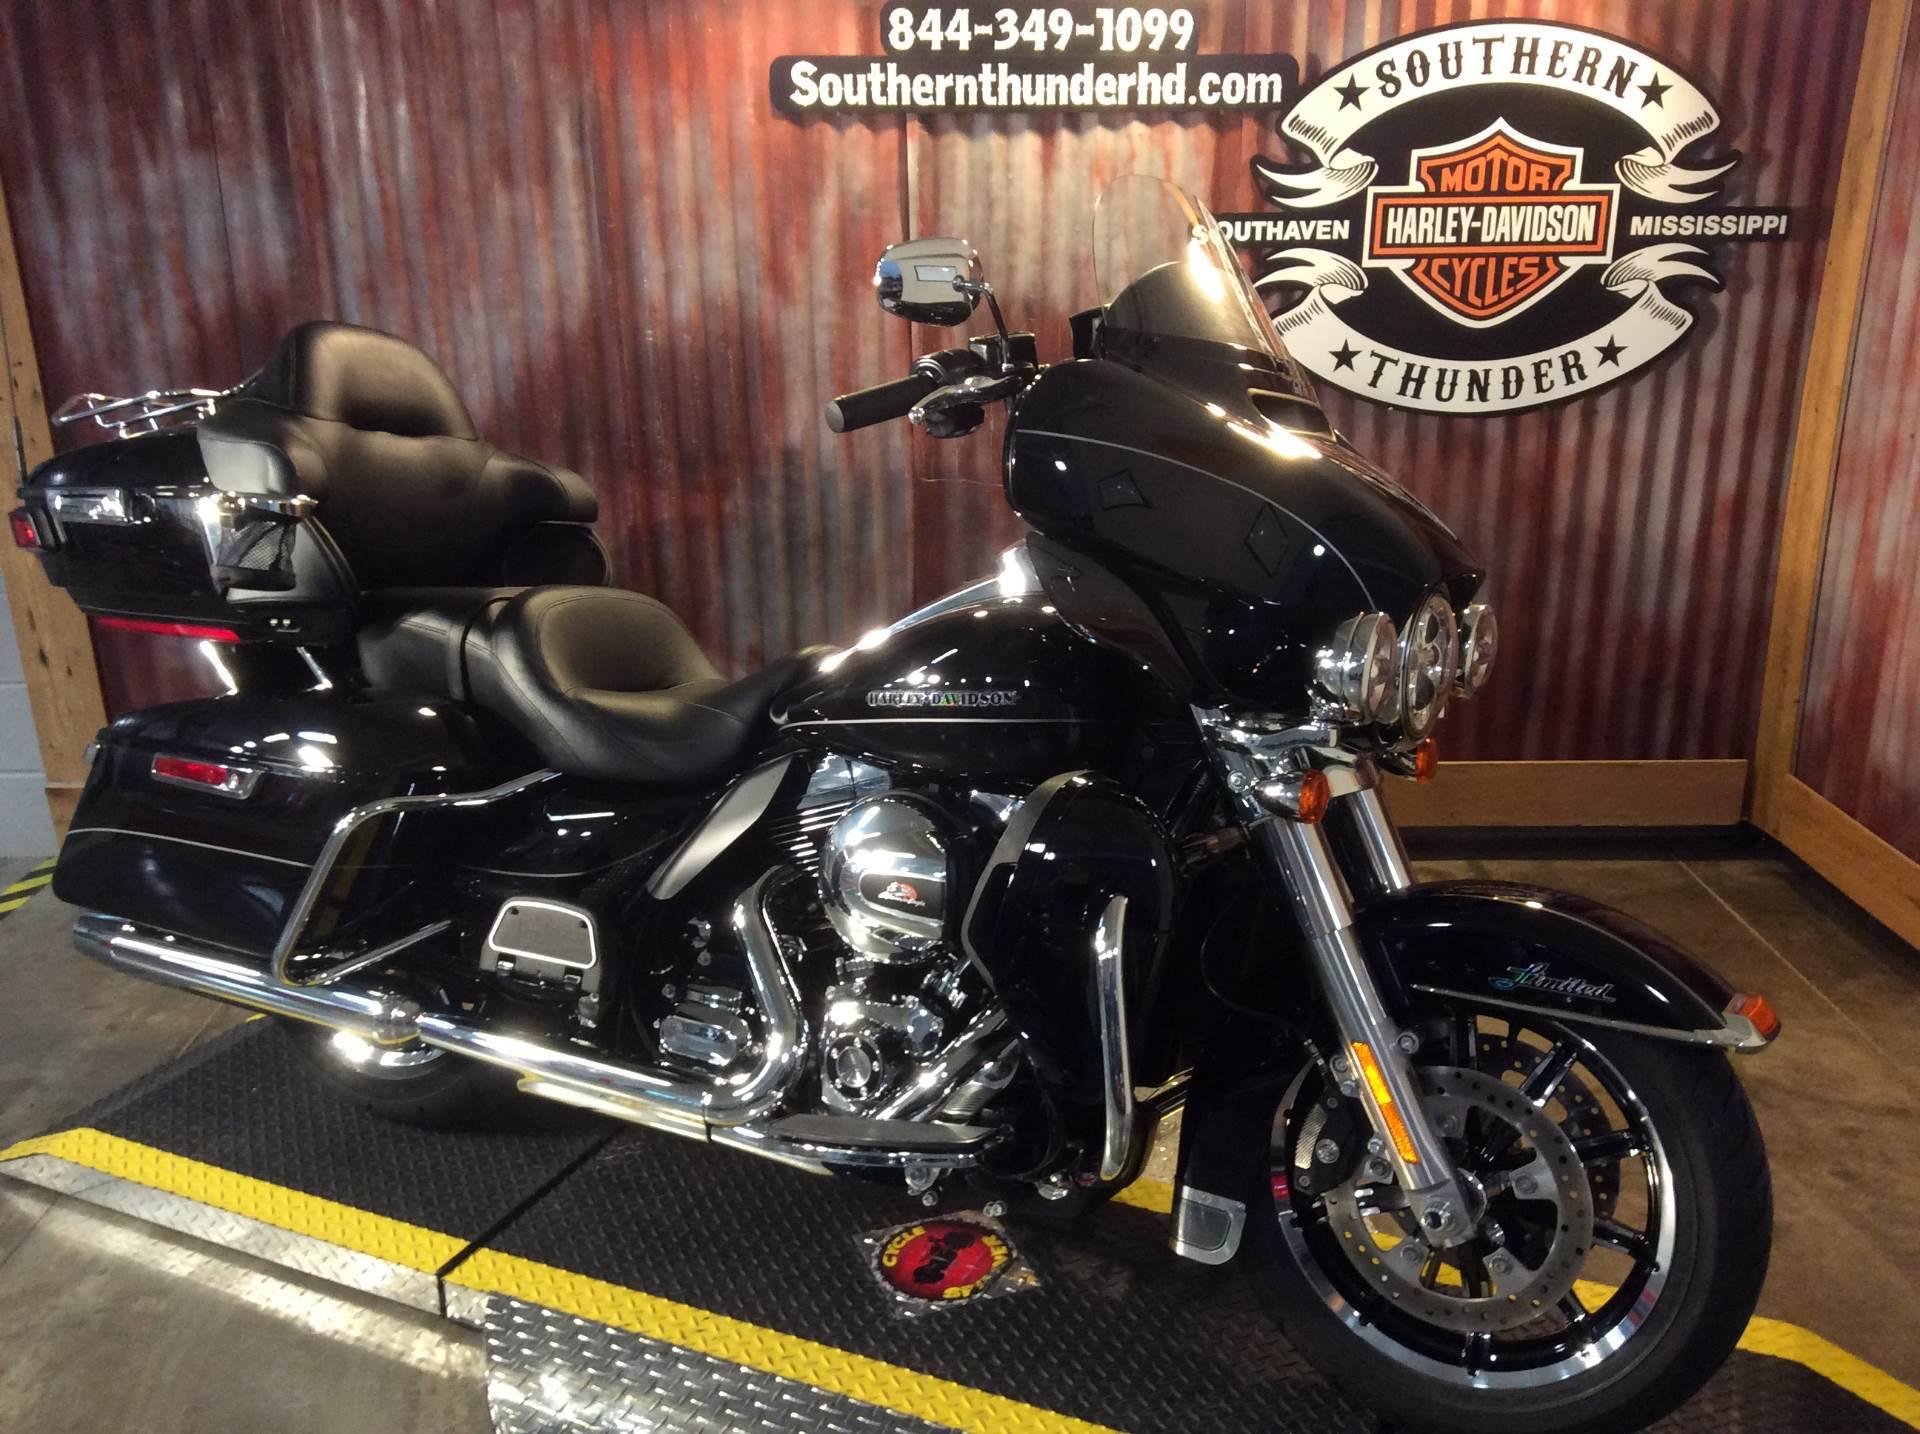 2016 Harley-Davidson Ultra Limited in Southaven, Mississippi